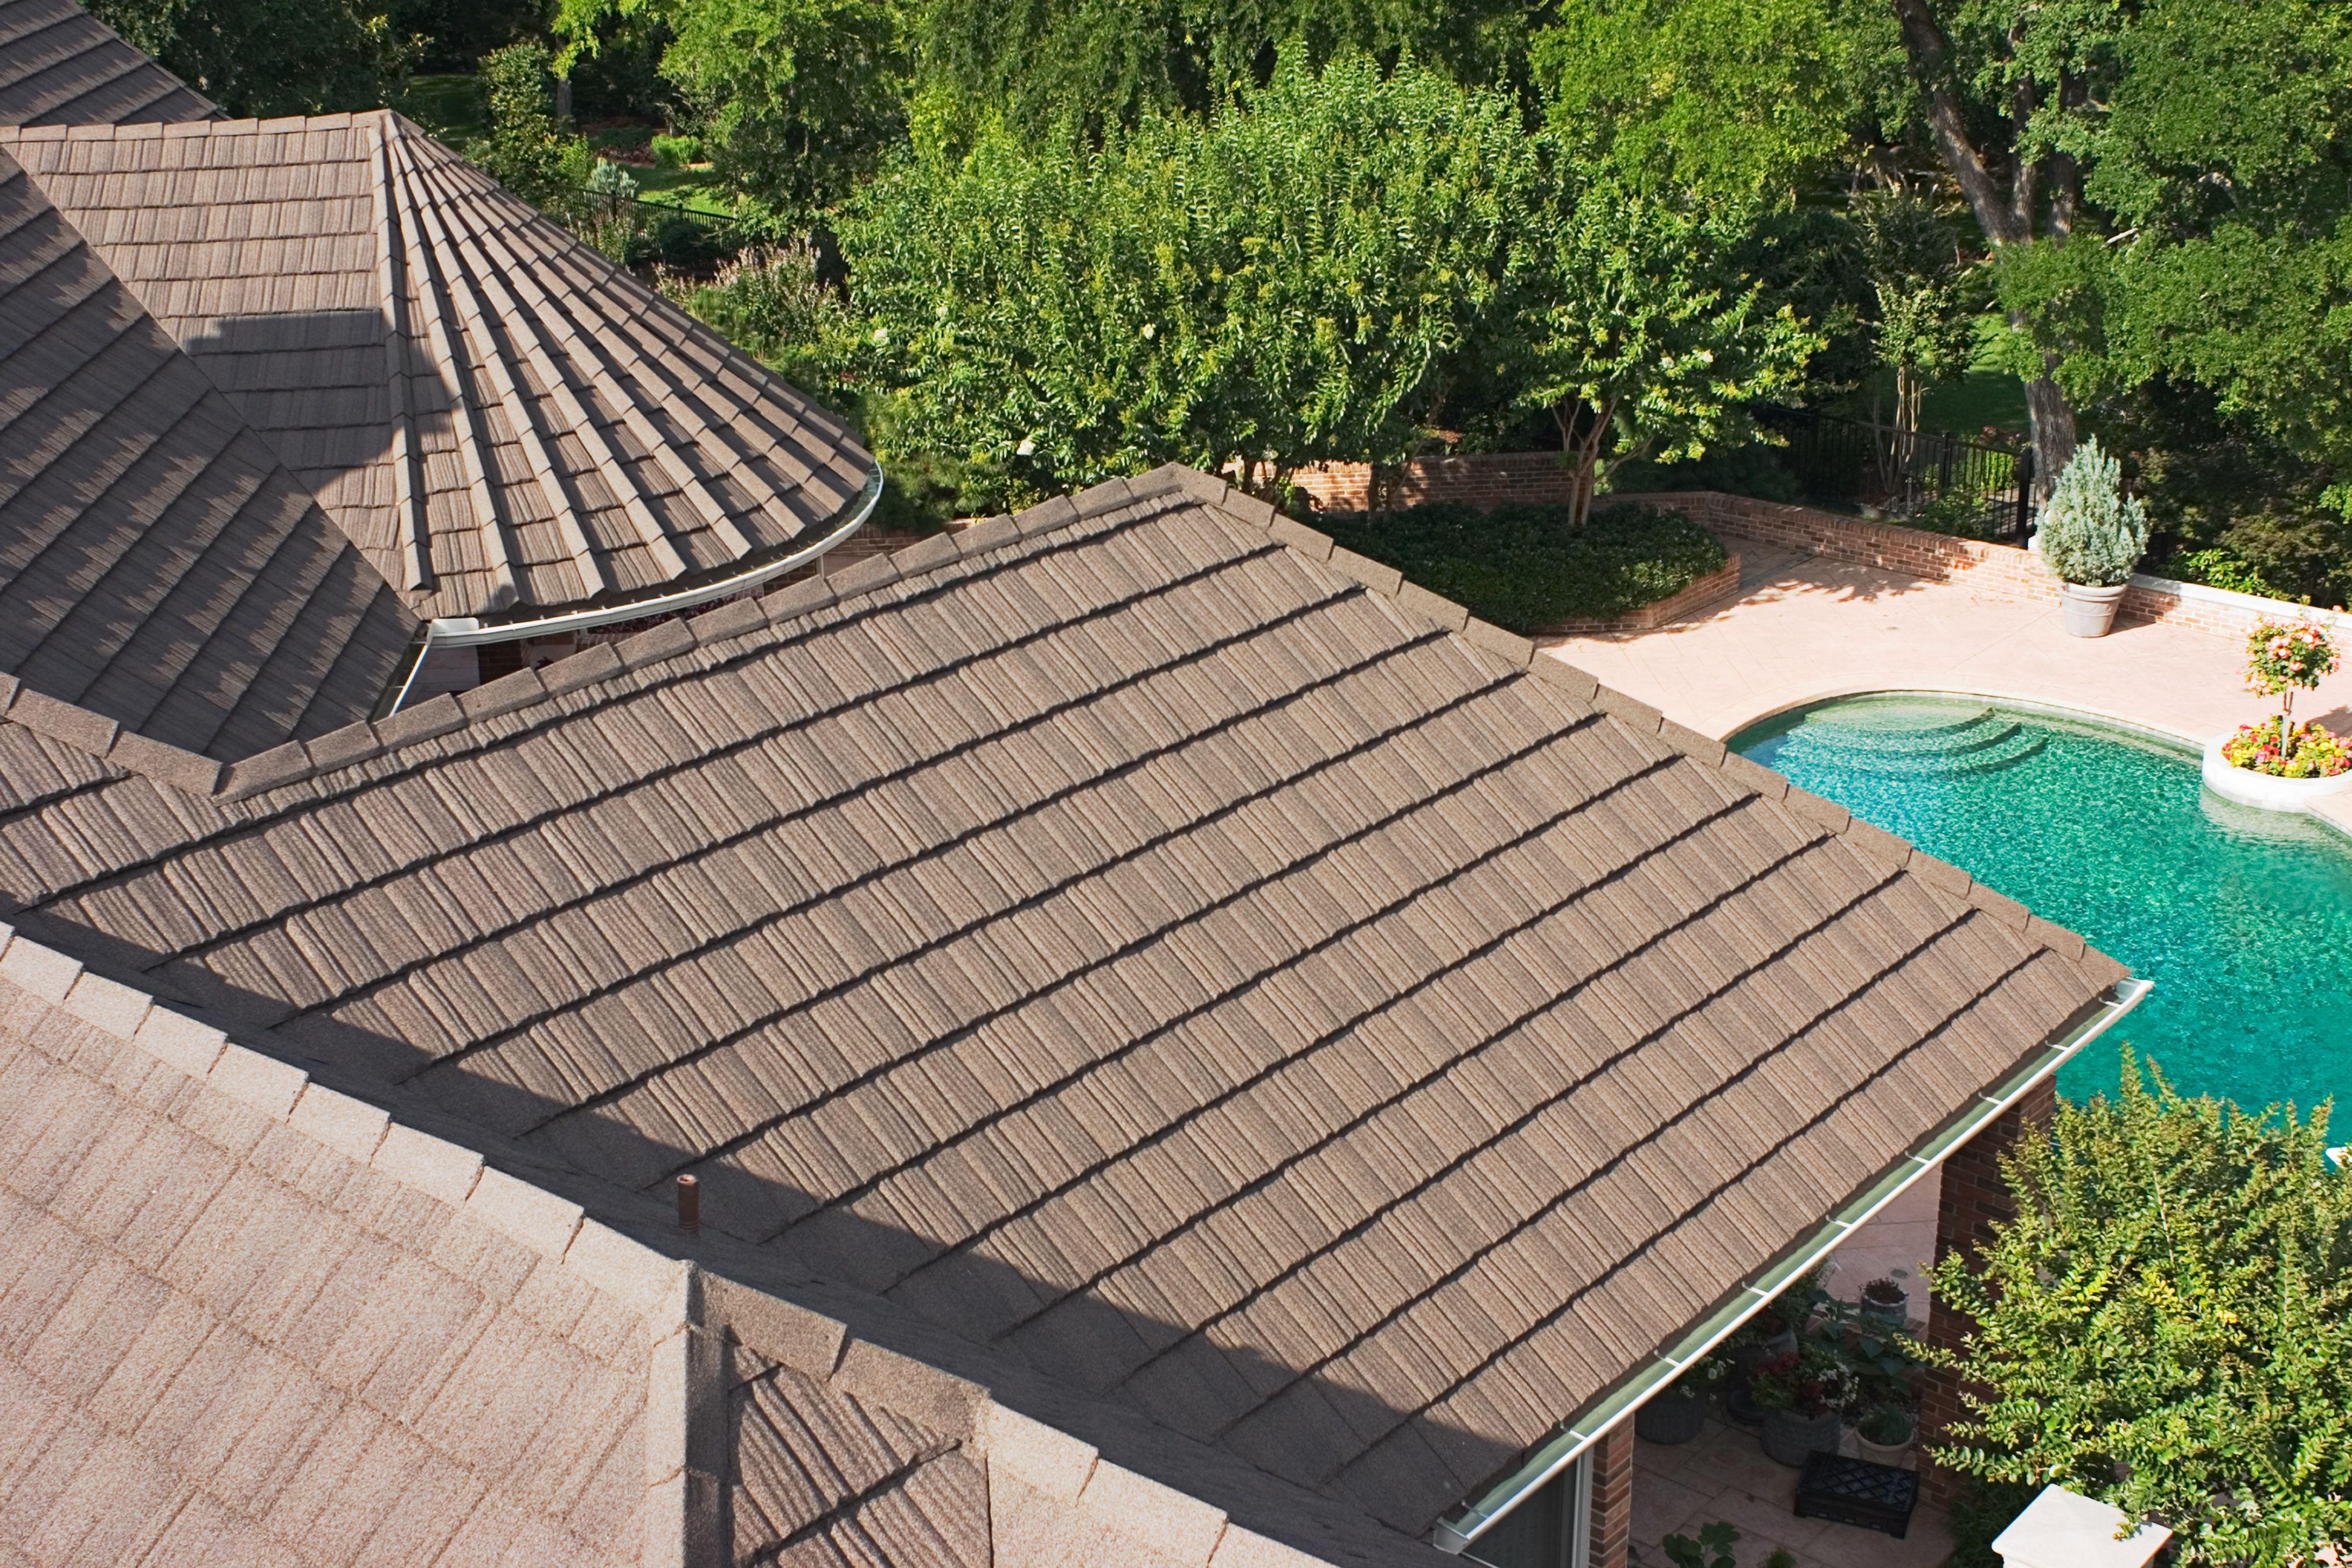 Gerard Stone Coated Steel Metal Roofing Timberwood Canyon Shake Residential Metal Roofing Metal Roof Roof Styles